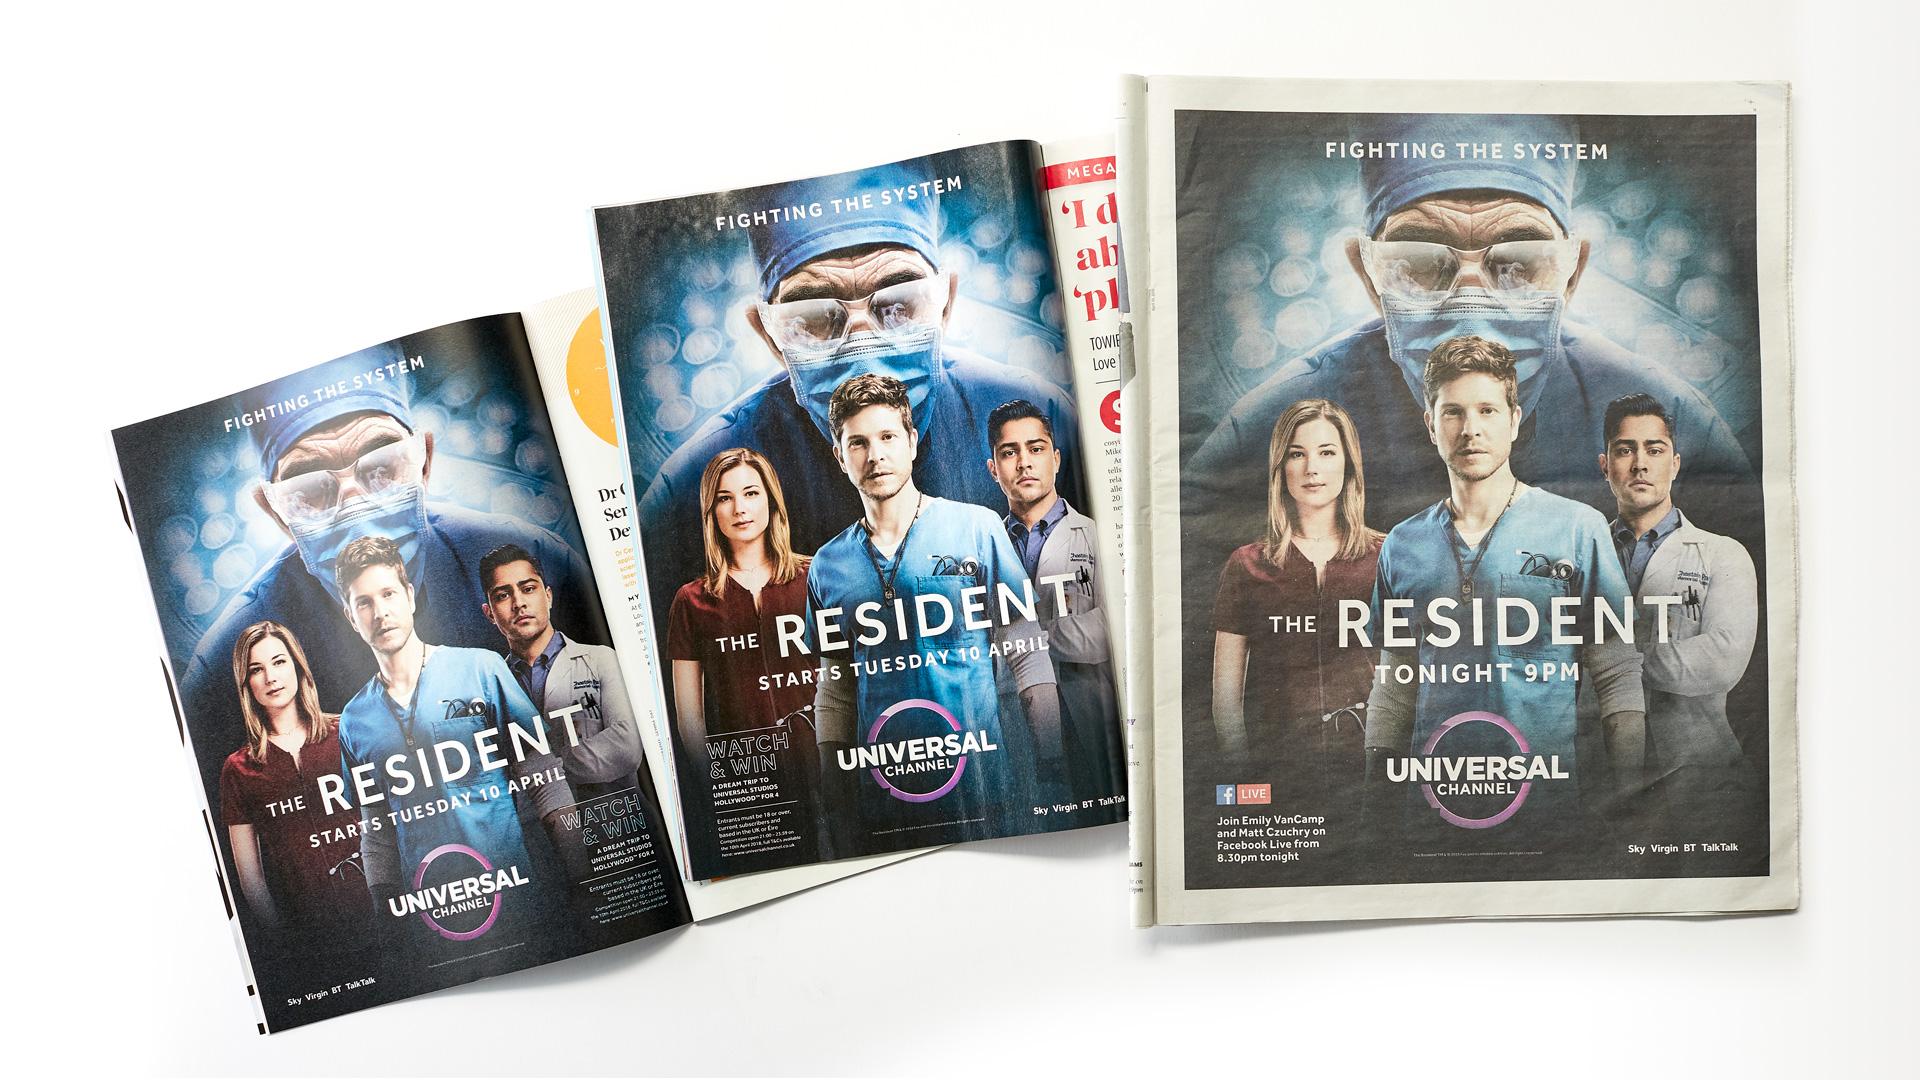 the-resident-repro-press-ad-nbc-universal